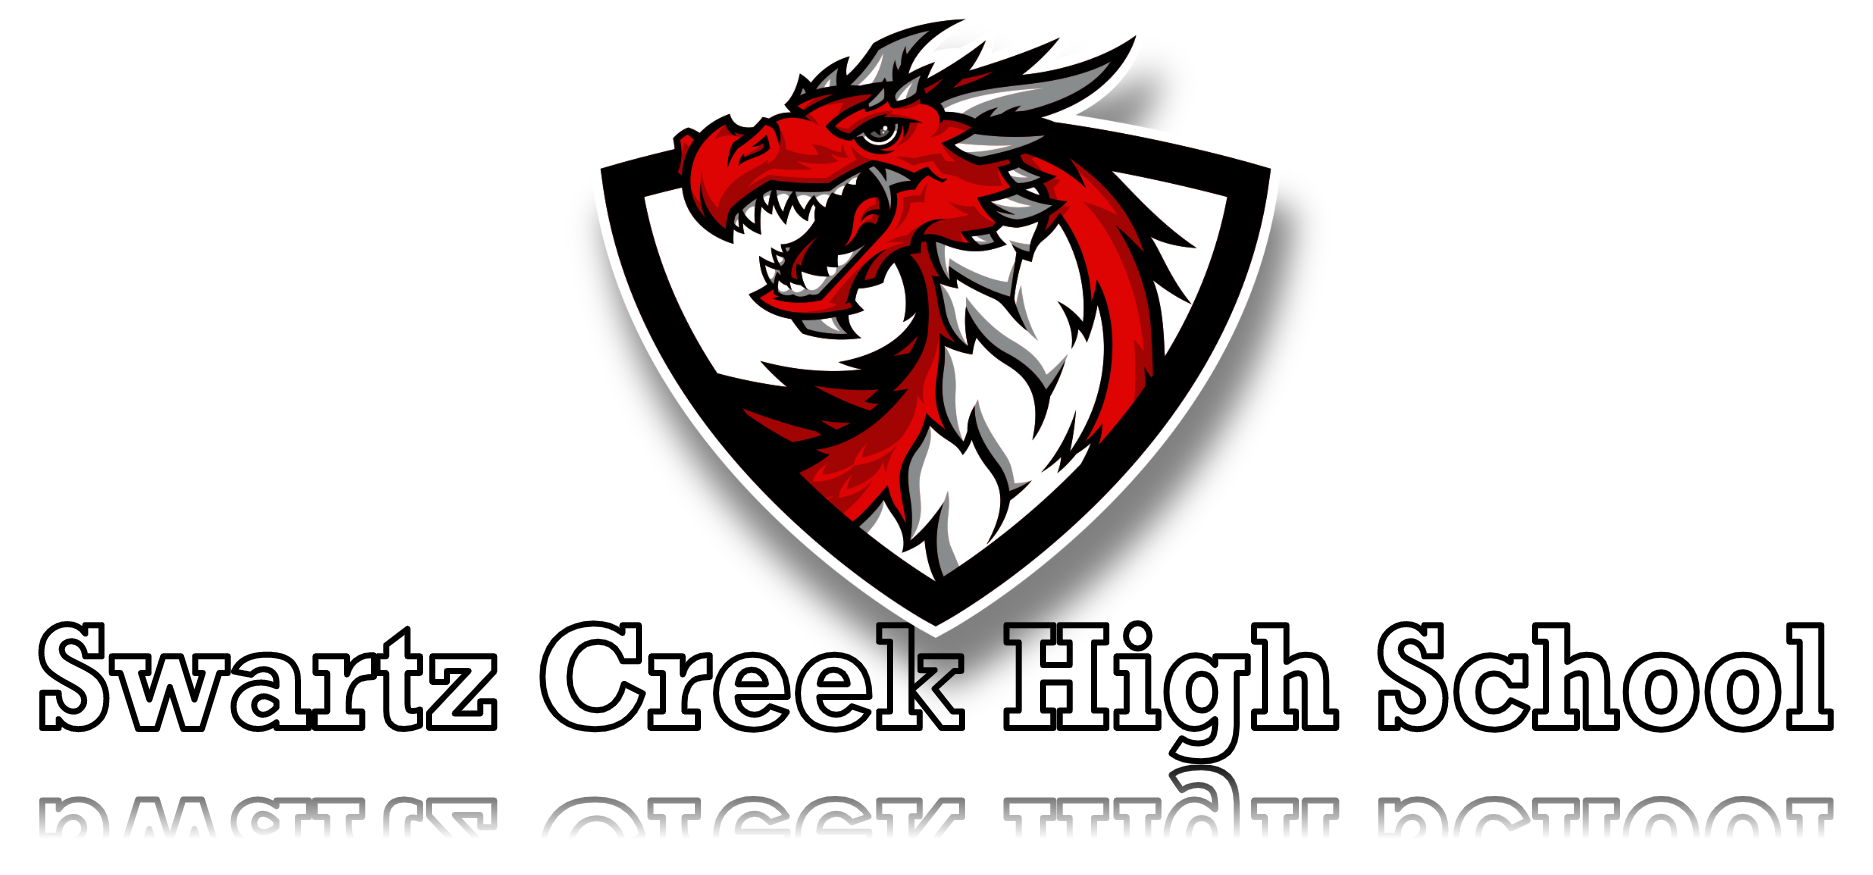 Dragon mascot and Title of Swartz Creek High School